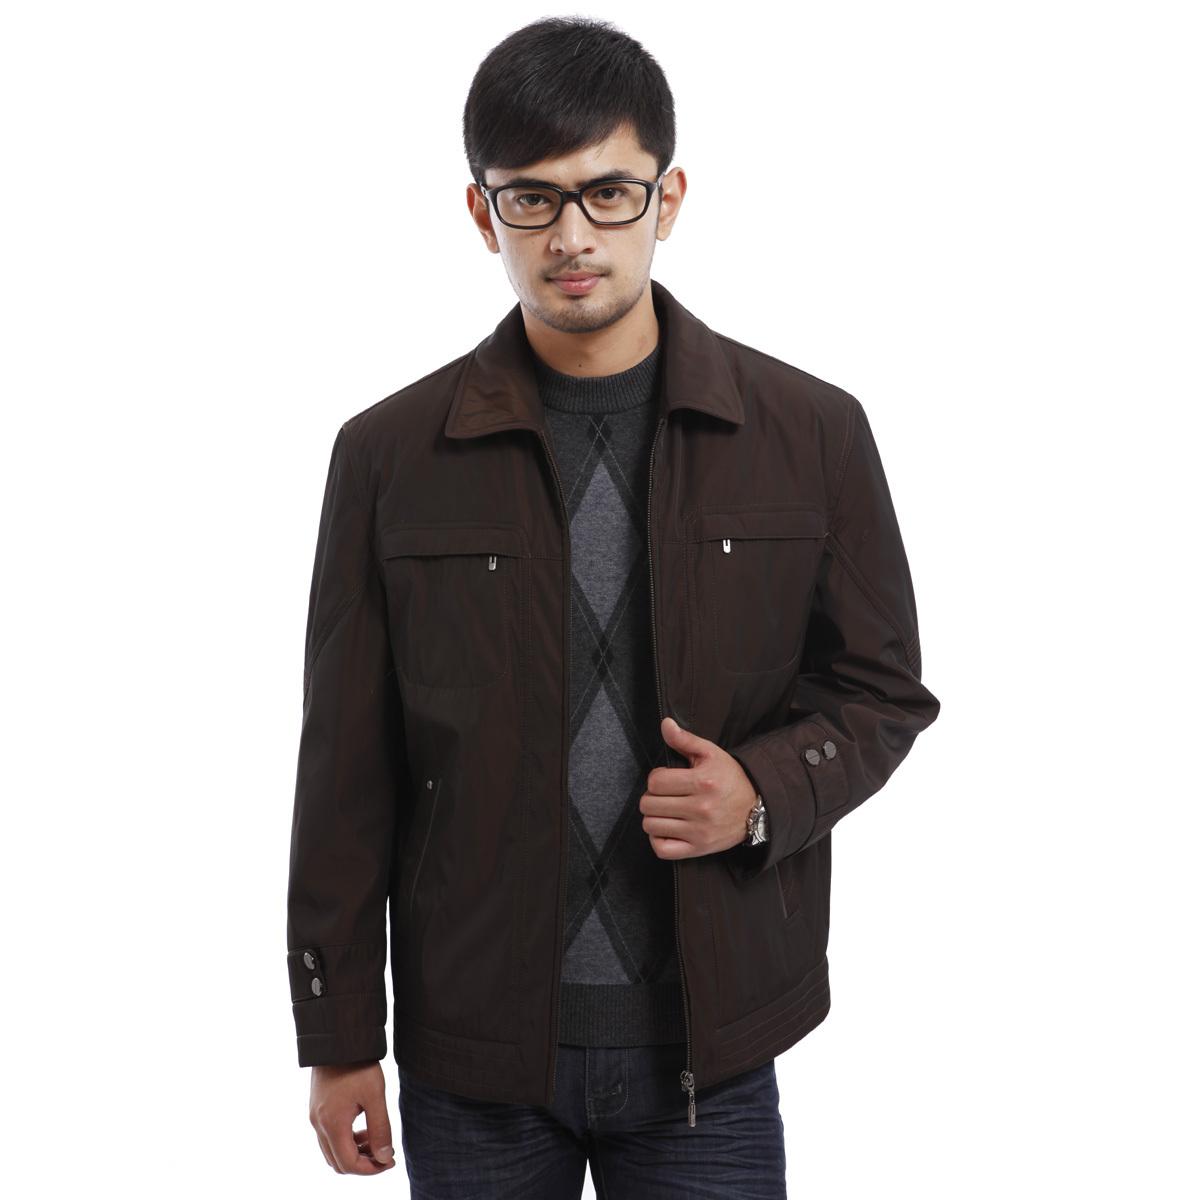 Куртка Cemil N/0908 2012 N-0908 Средней длины (до середины бедра и ниже) Прямой покрой